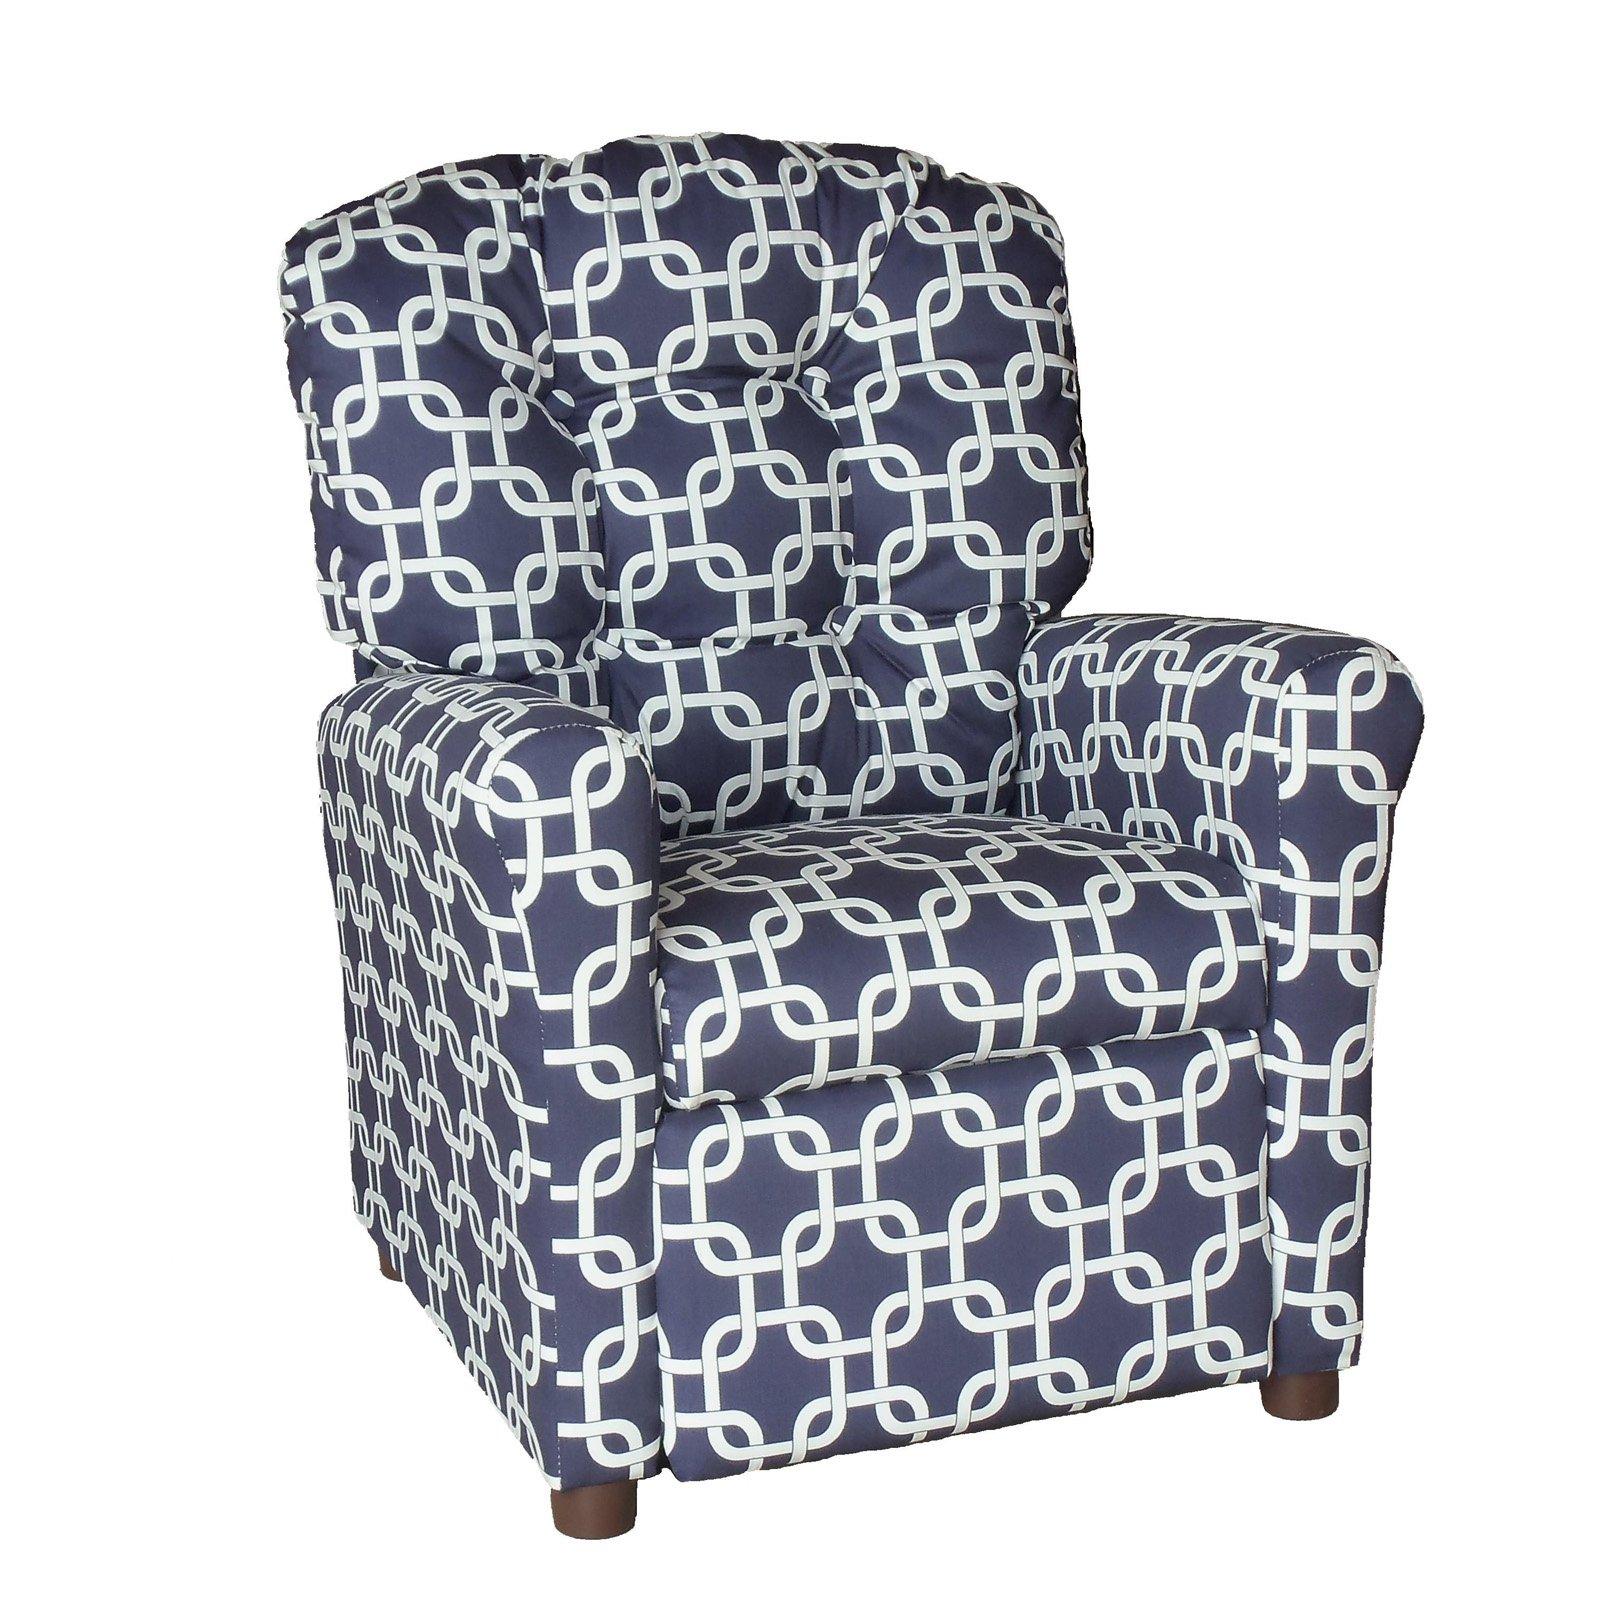 Brazil Furniture 4-Button Back Childrens Recliner - Gotcha Pattern